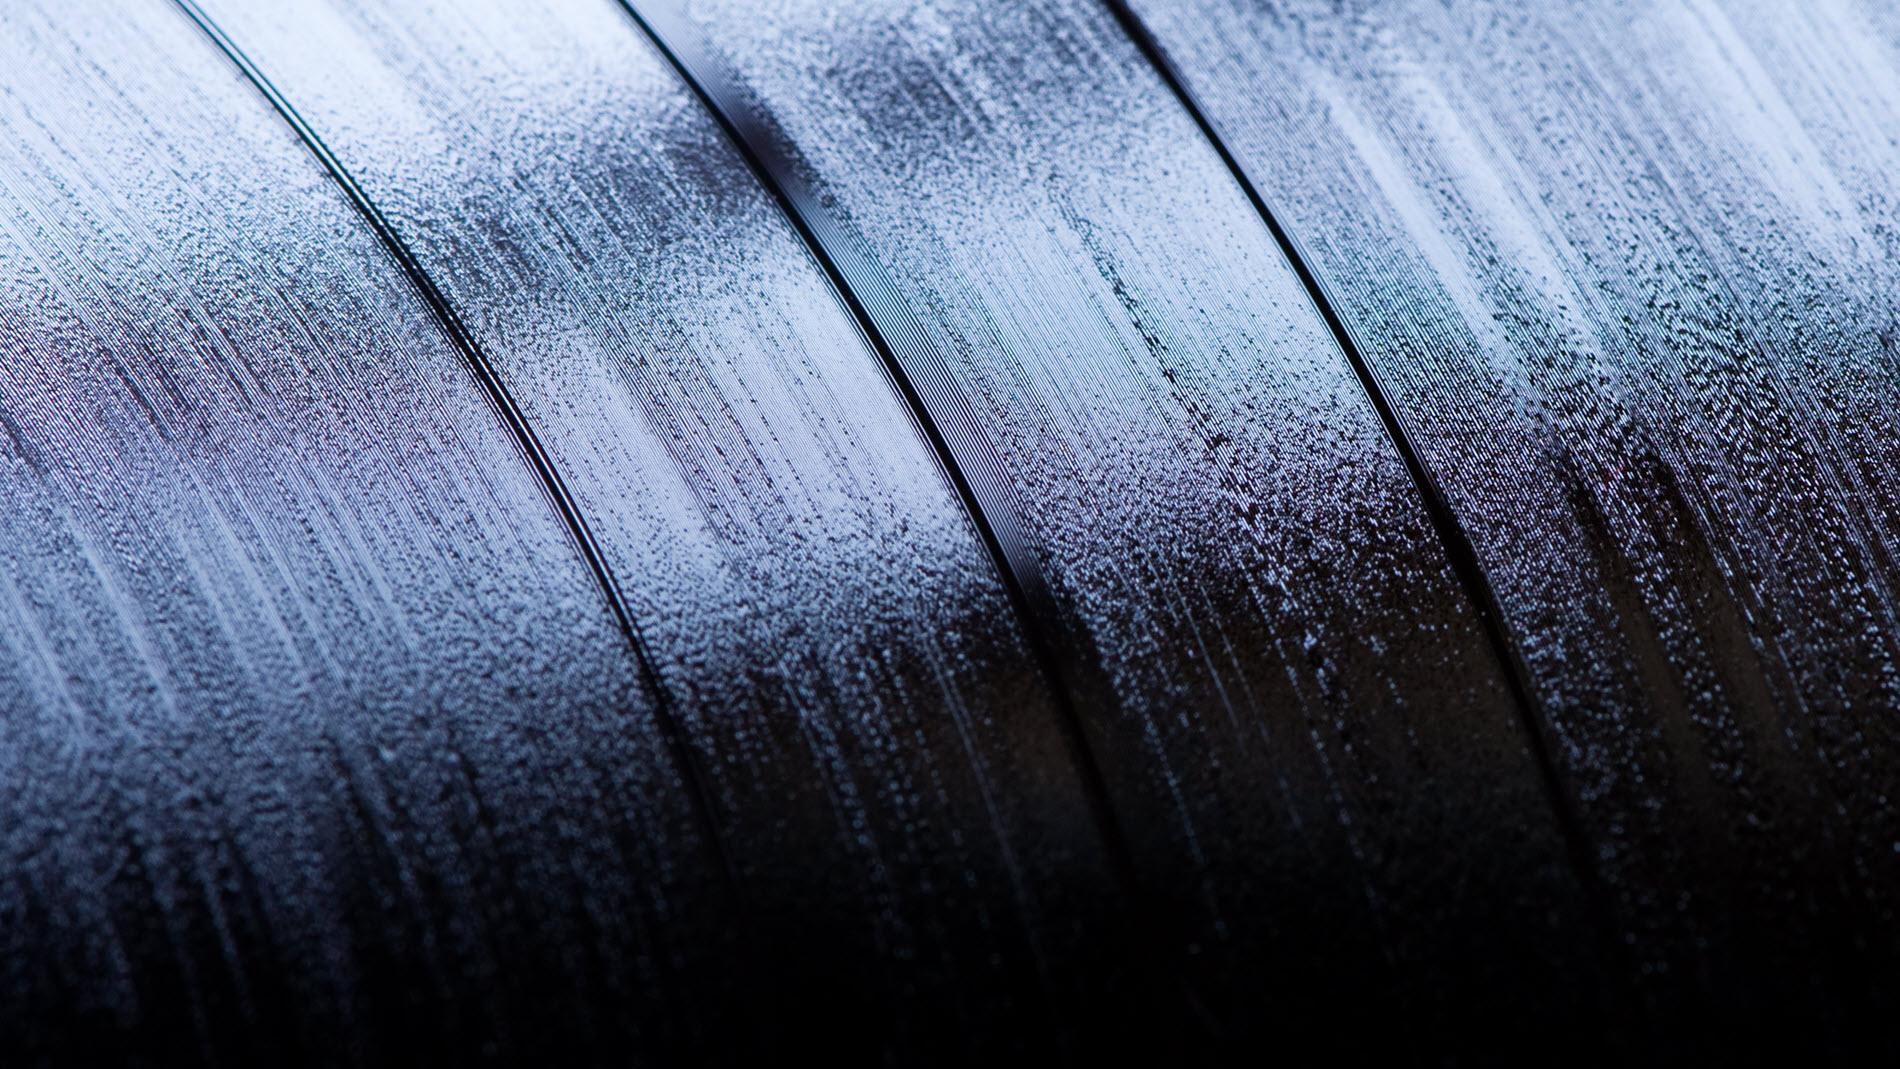 Closeup of vinyl record grooves.